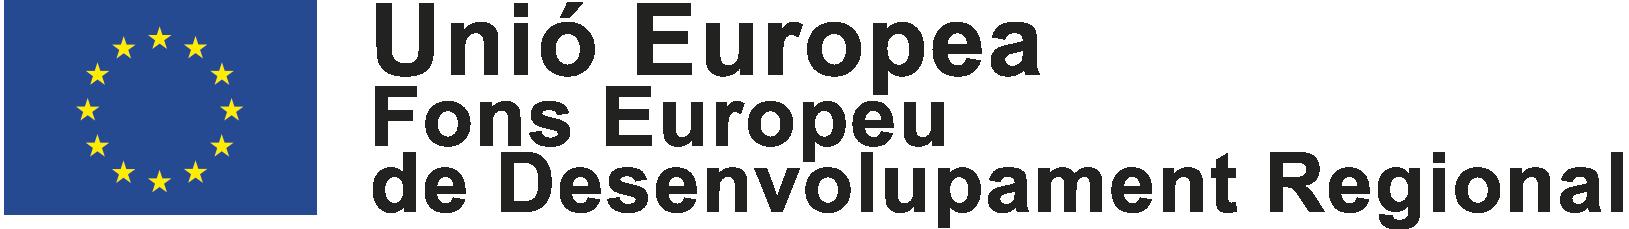 Logotip FEDER